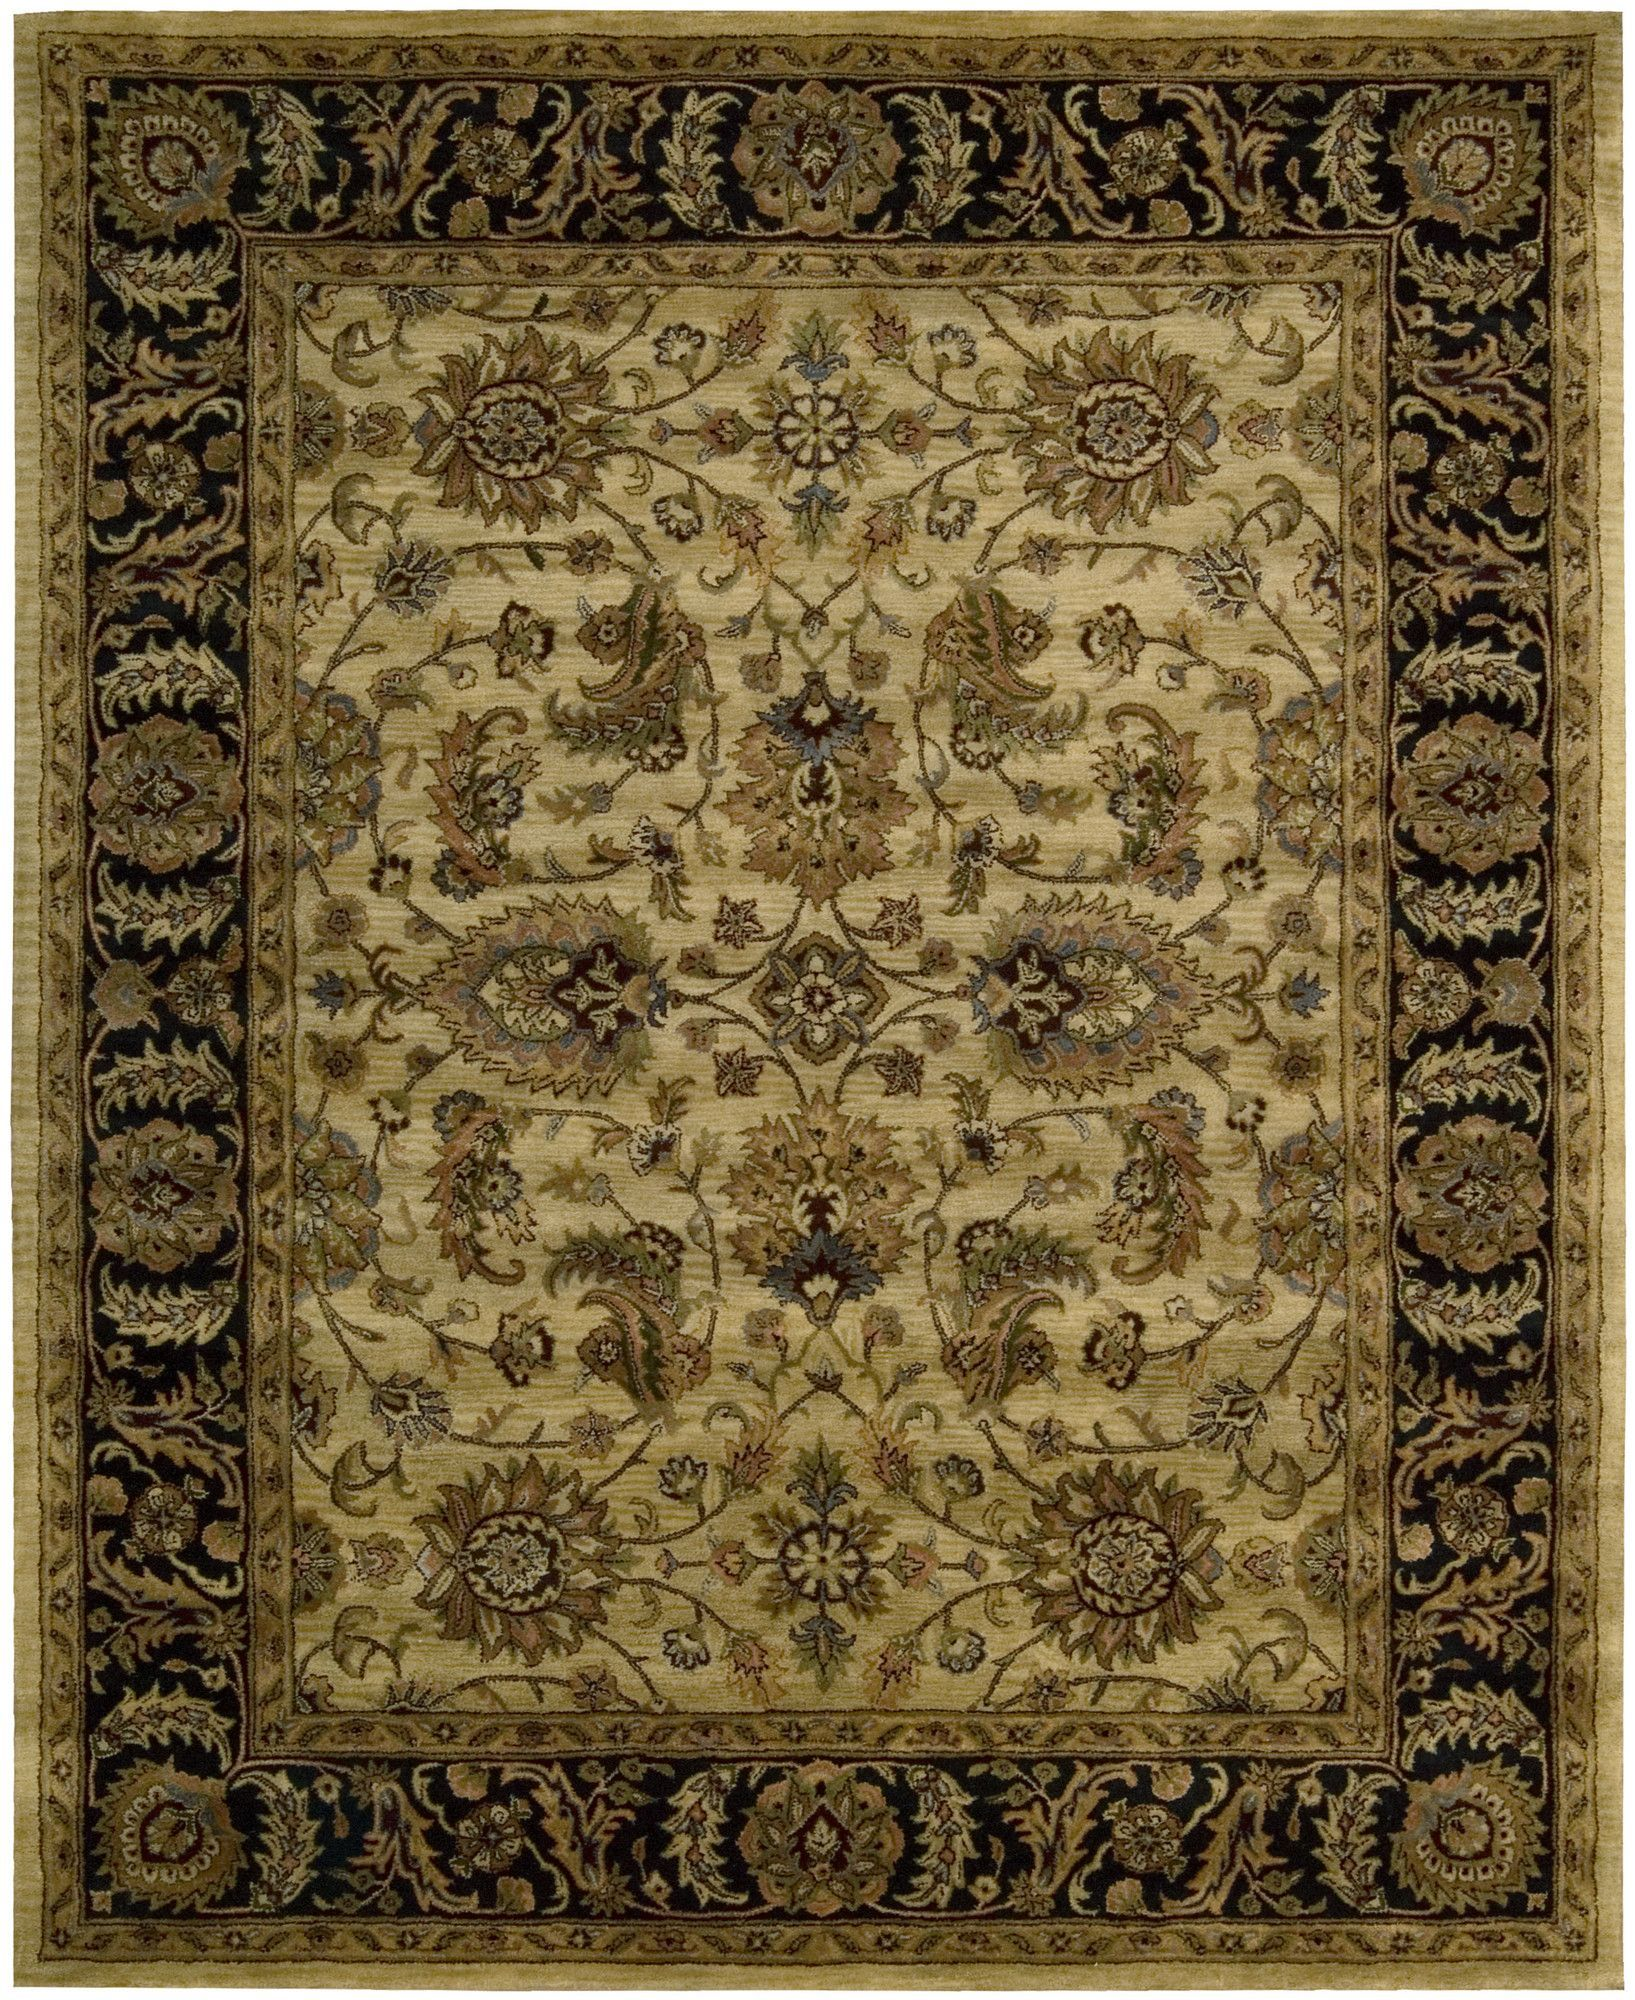 Bassham Hand Tufted Wool Light Gold Area Rug Nourison Area Rugs Rugs